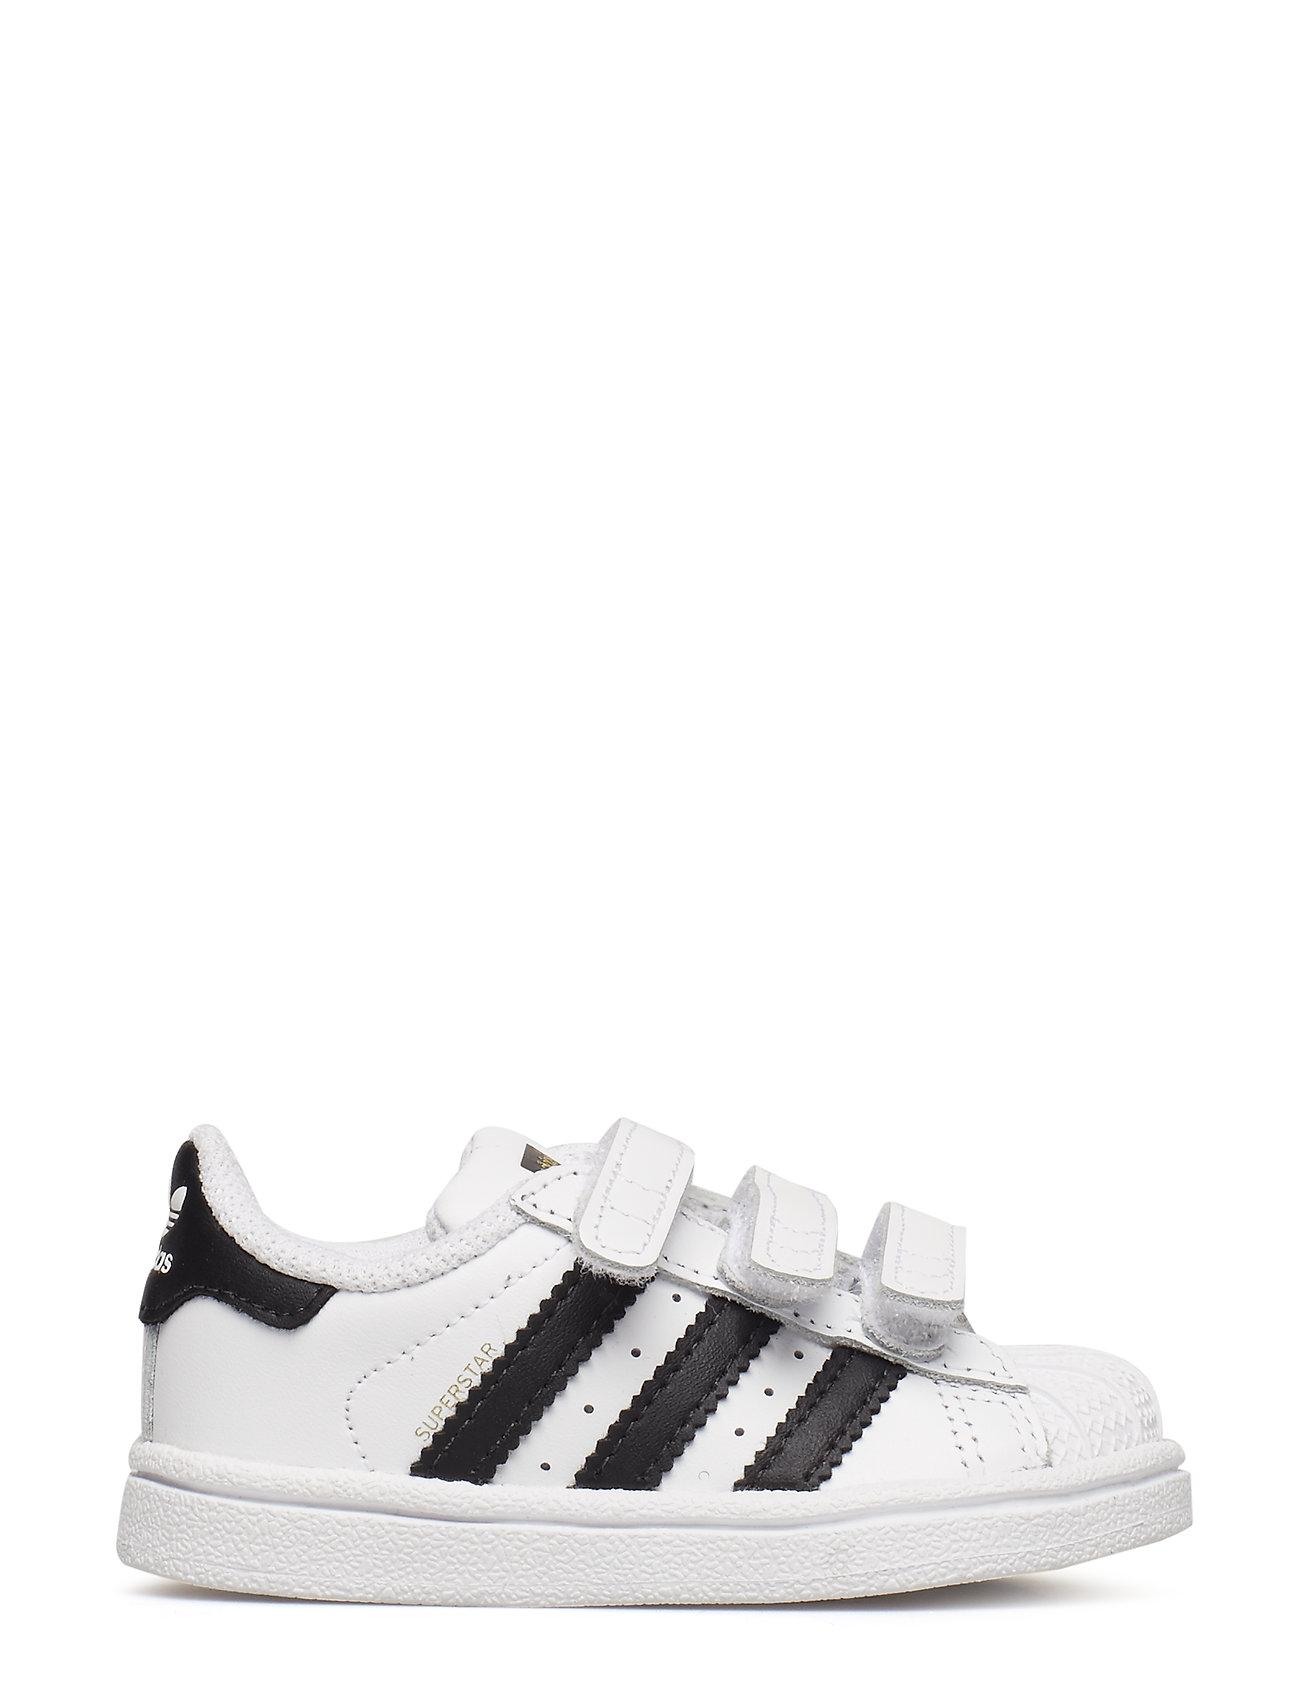 Superstar Cf I Sneakers Sko Hvid Adidas Originals